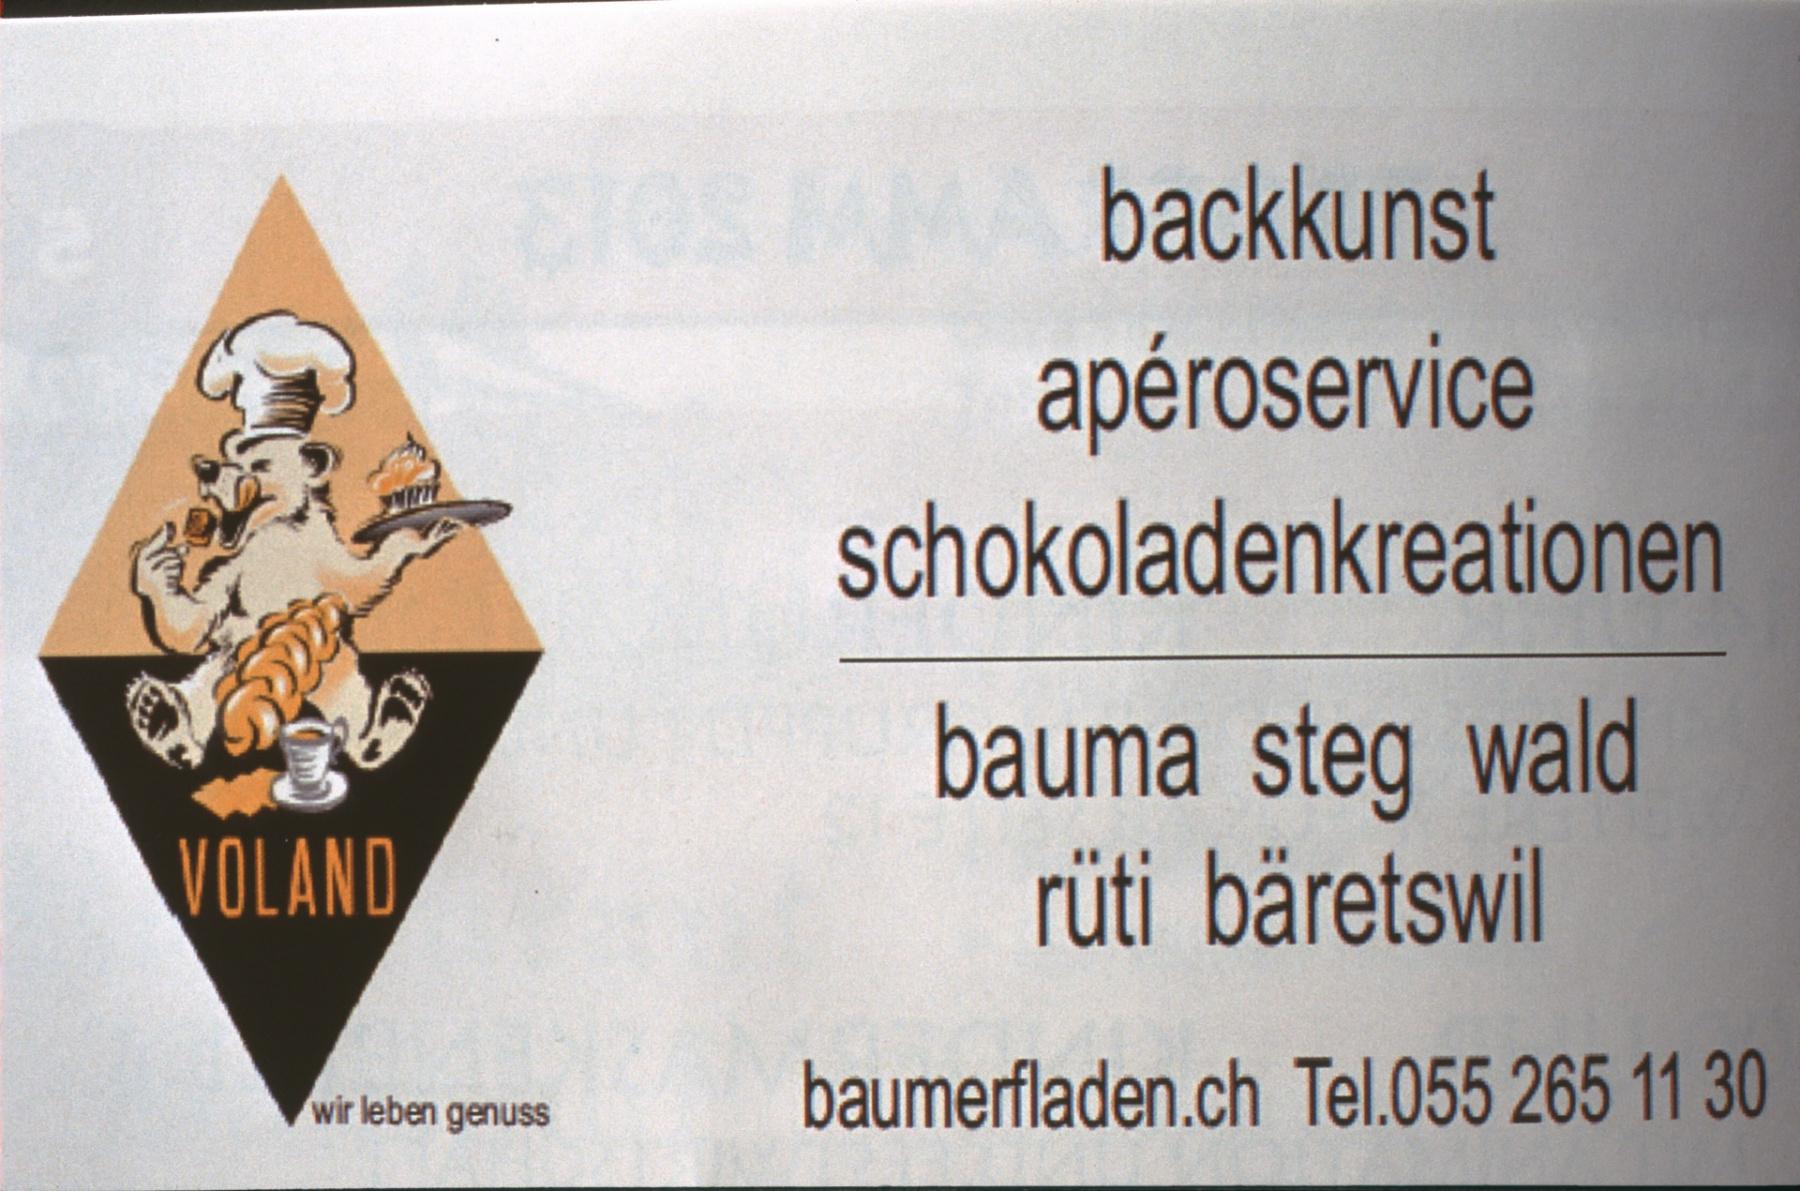 Café Bäckerei Konditorei Voland, Broschüre Fassnacht Bäretswil